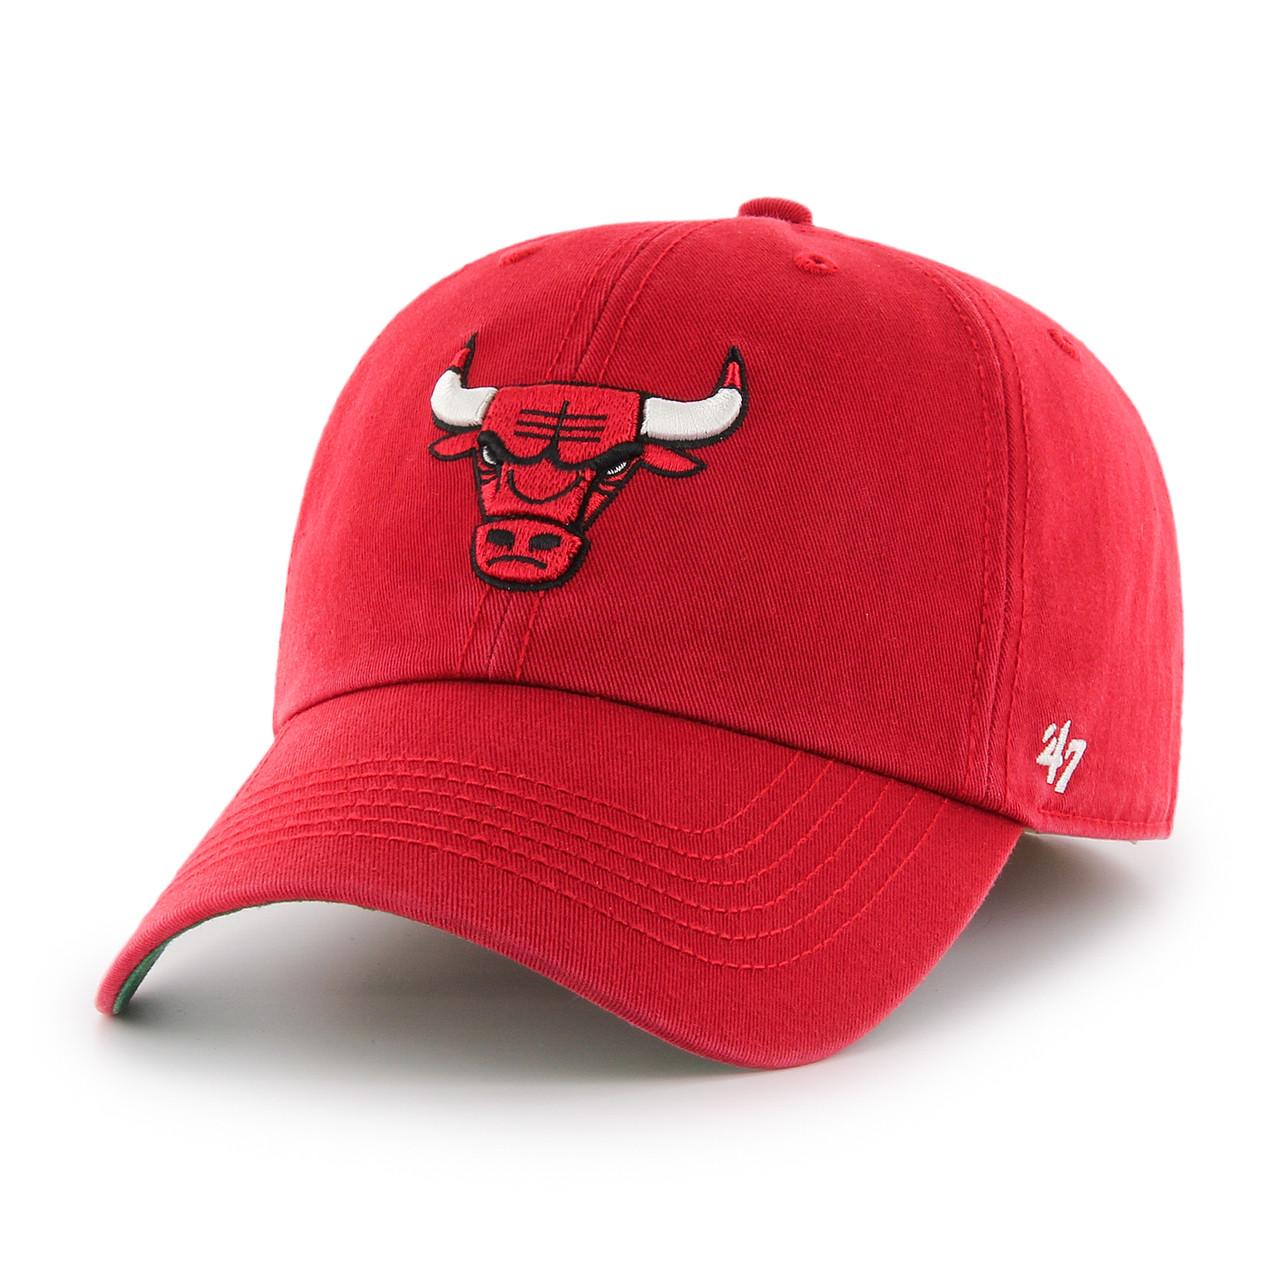 3a51daba6e Chicago Bulls  47 Brand Franchise - Red - Basketball Republic